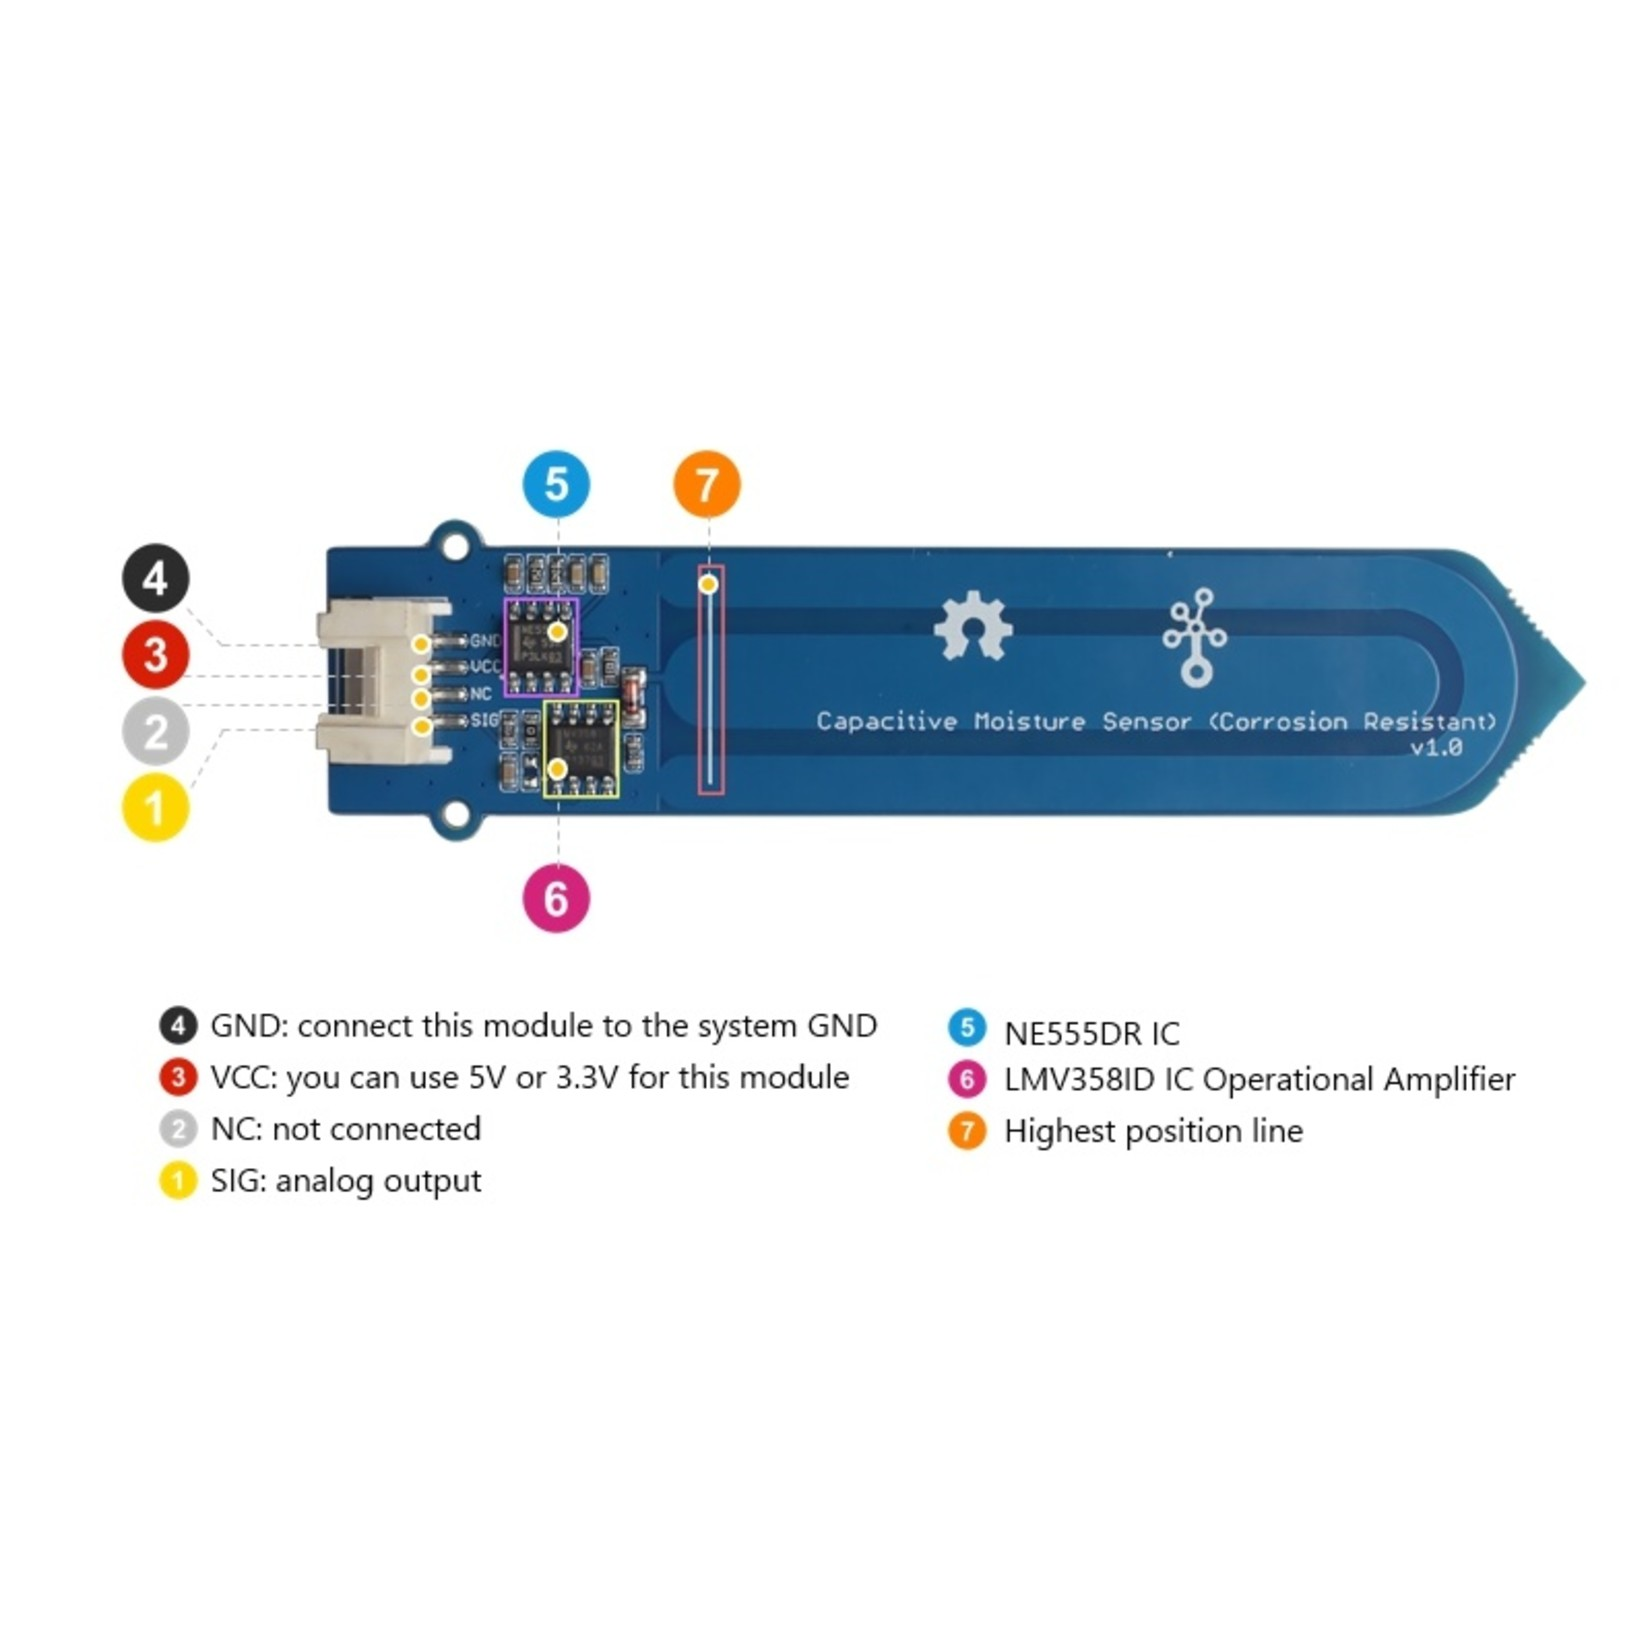 Seeed Grove - Capacitive Moisture Sensor (Corrosion Resistant)